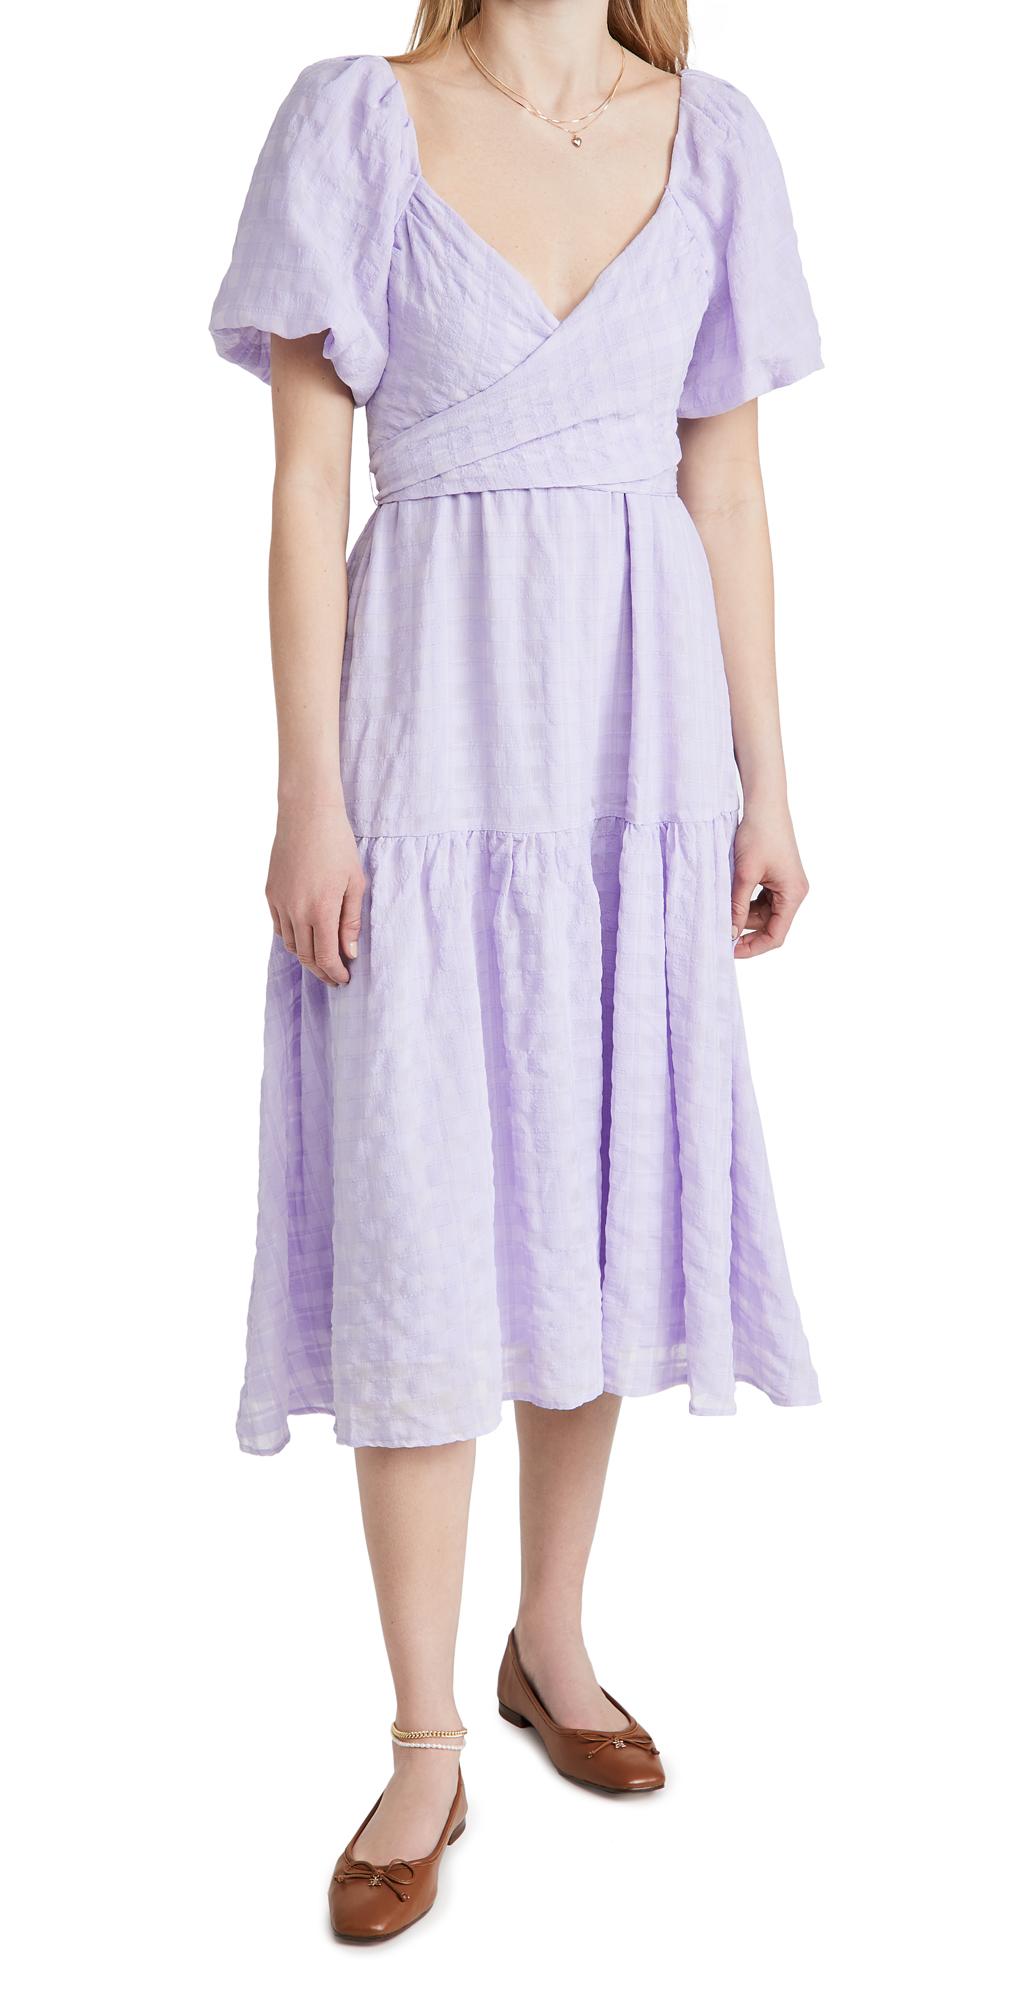 Astr SONNET DRESS